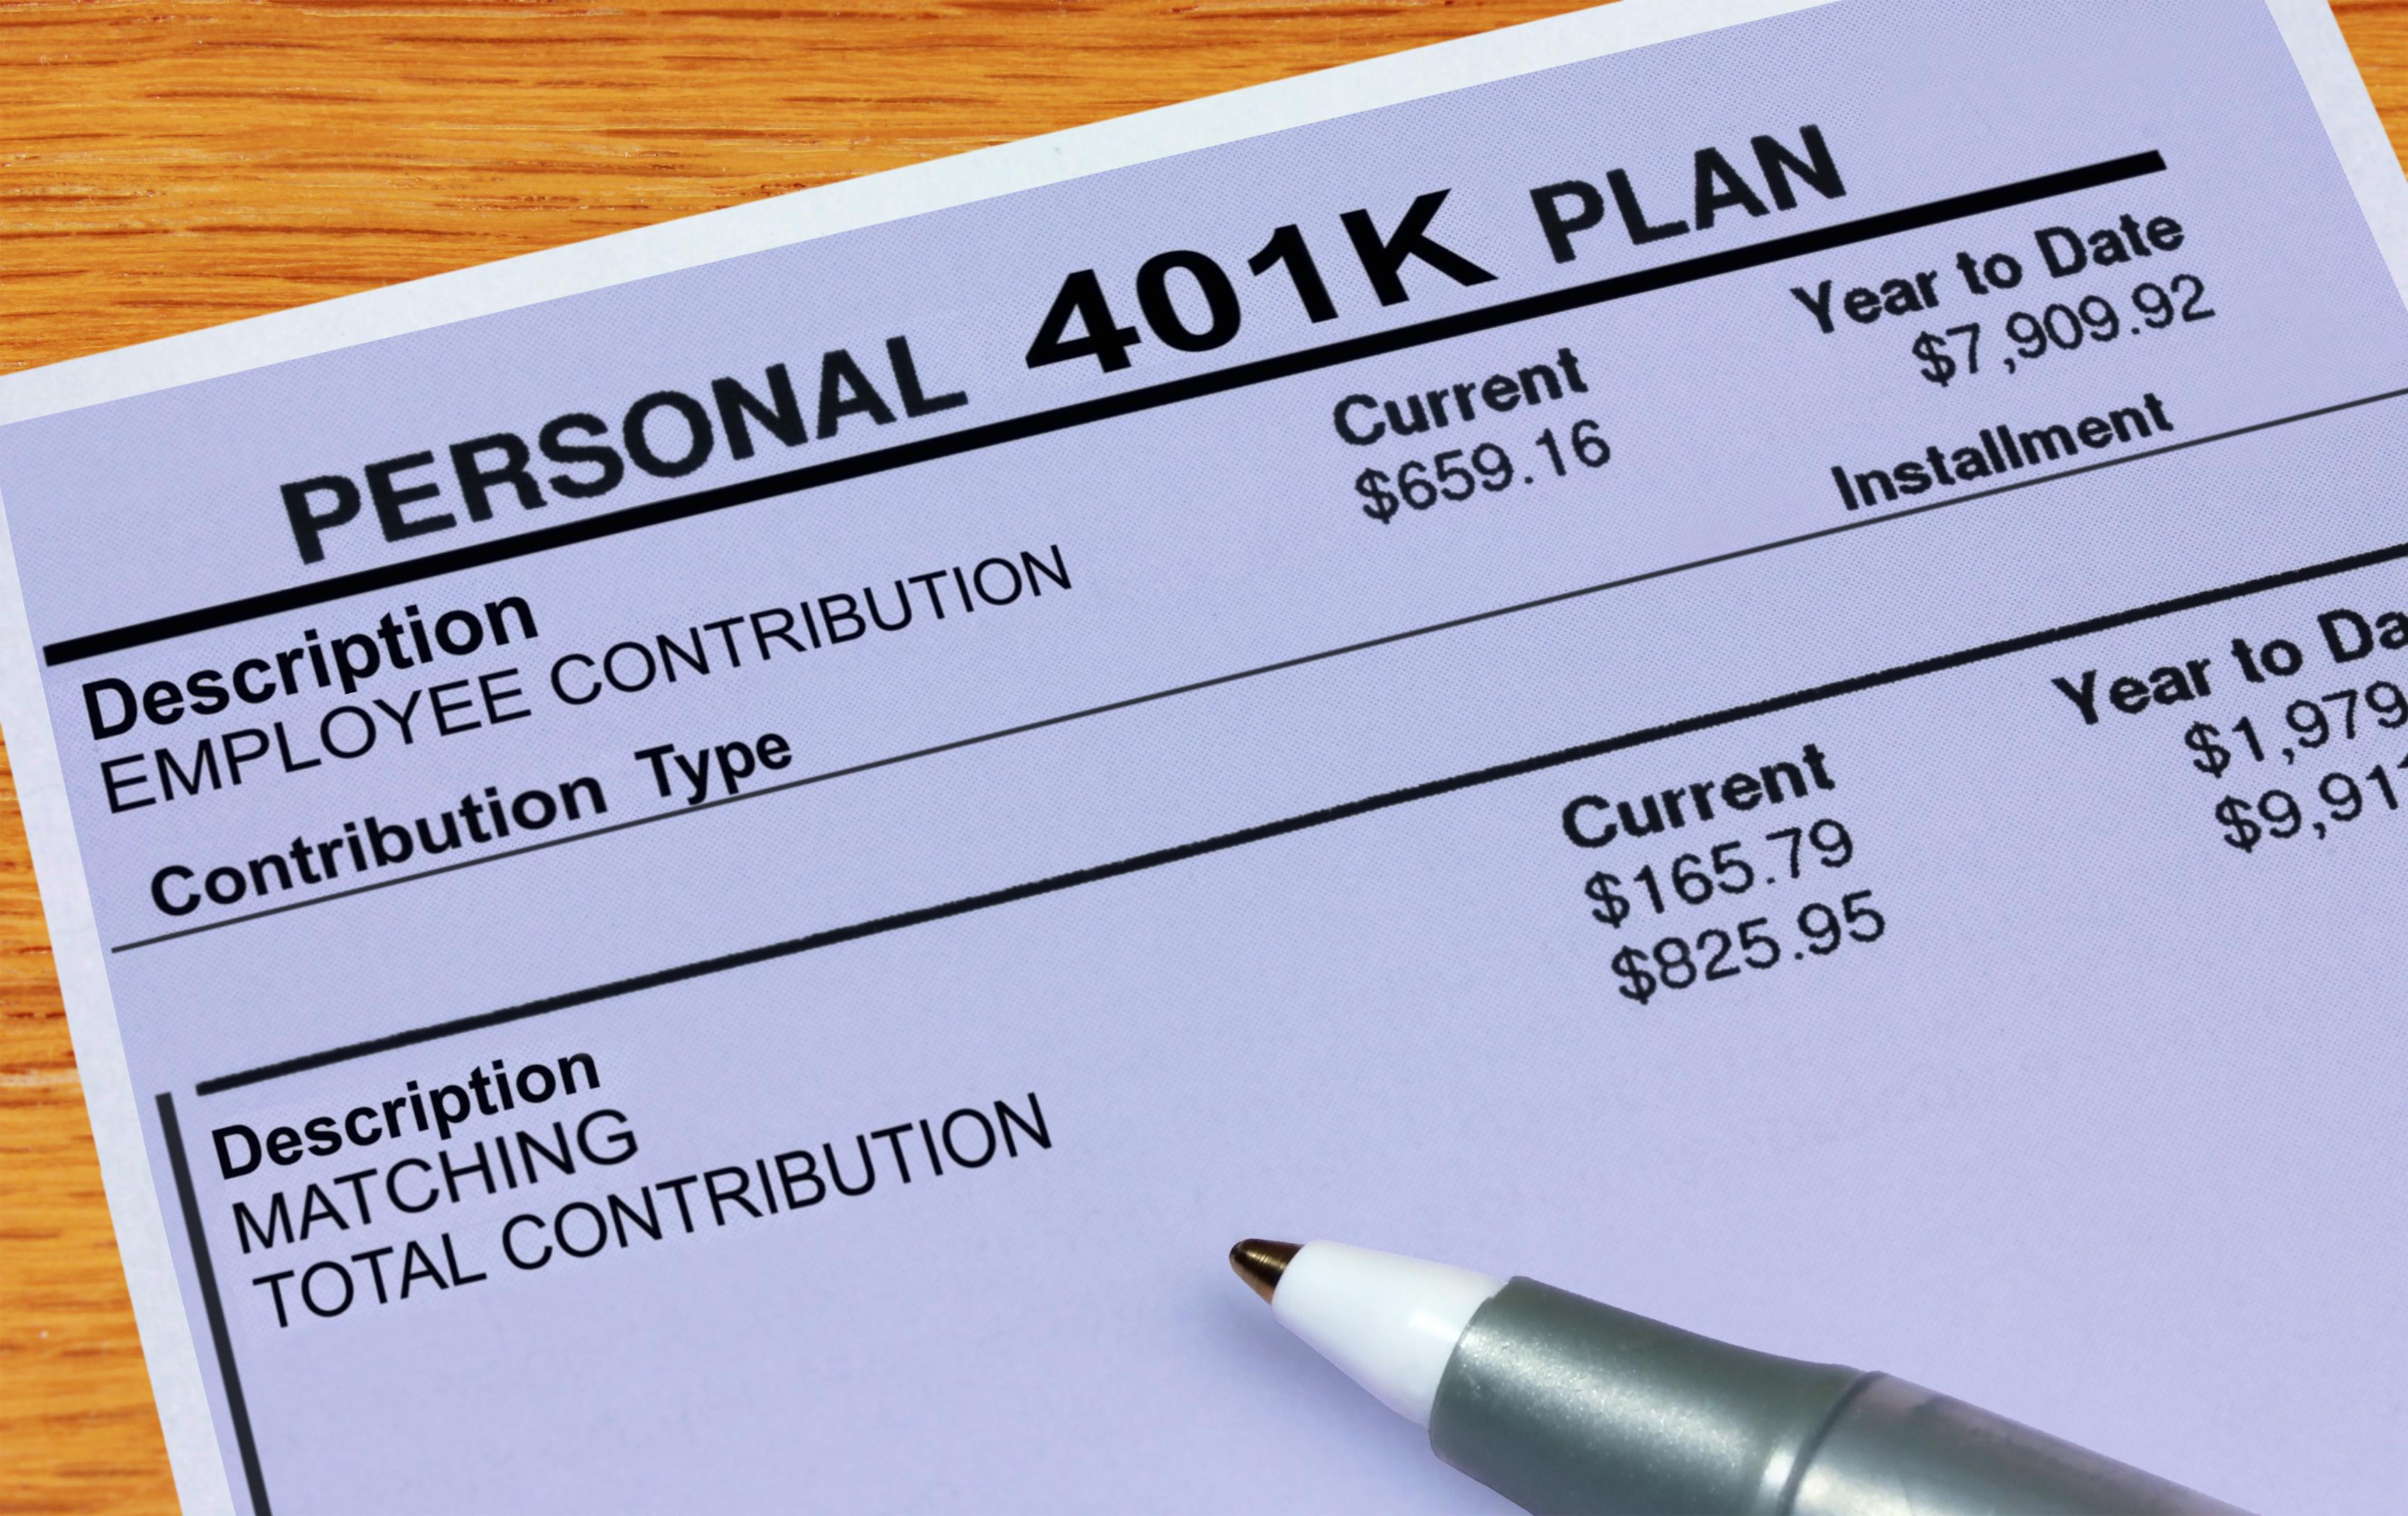 Form listing 401(k) match